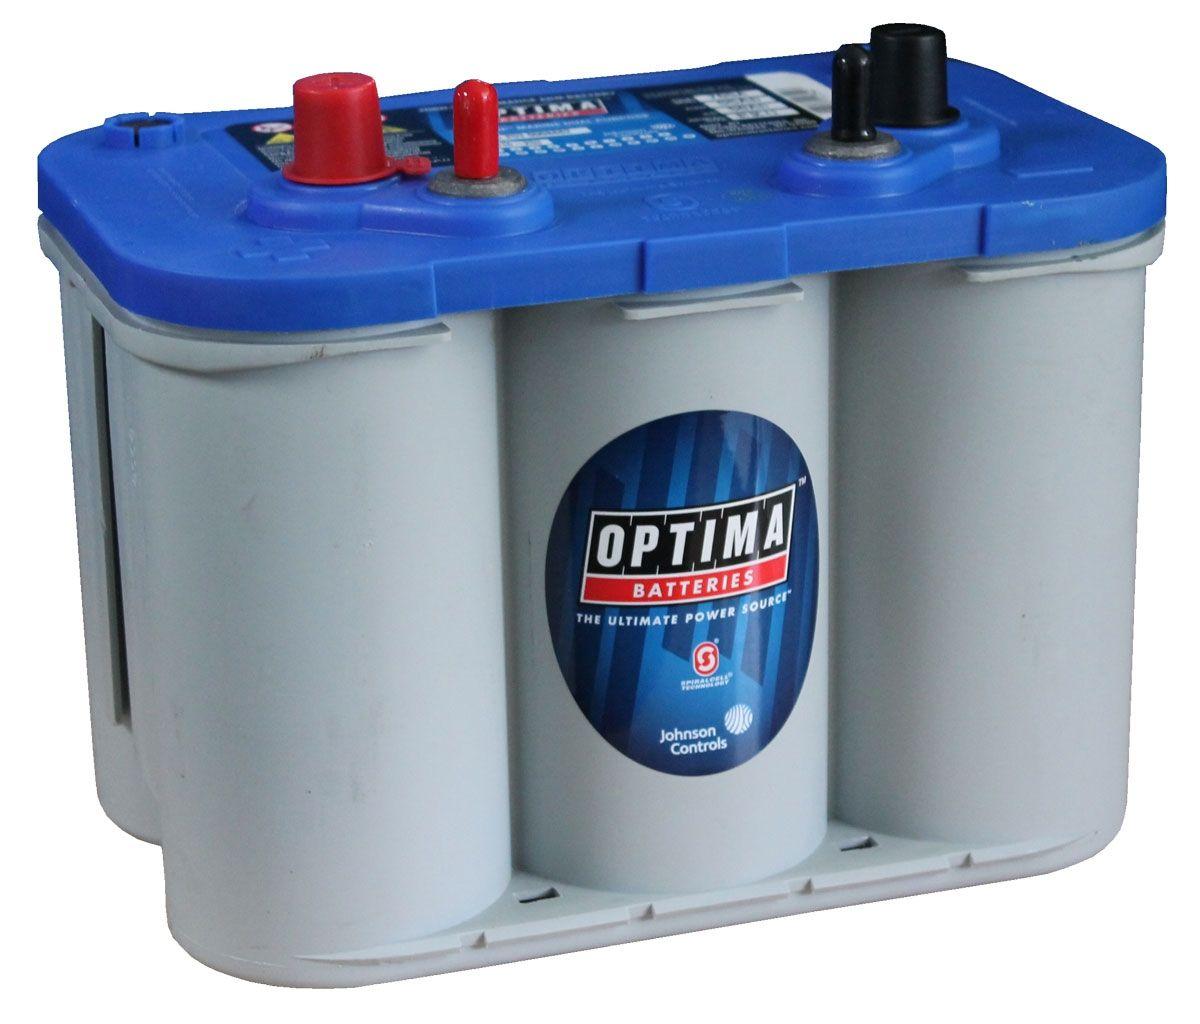 Optima Blue Top >> Optima Blue Top Battery Bt Dcm 4 2 8016 253 Bci D34m